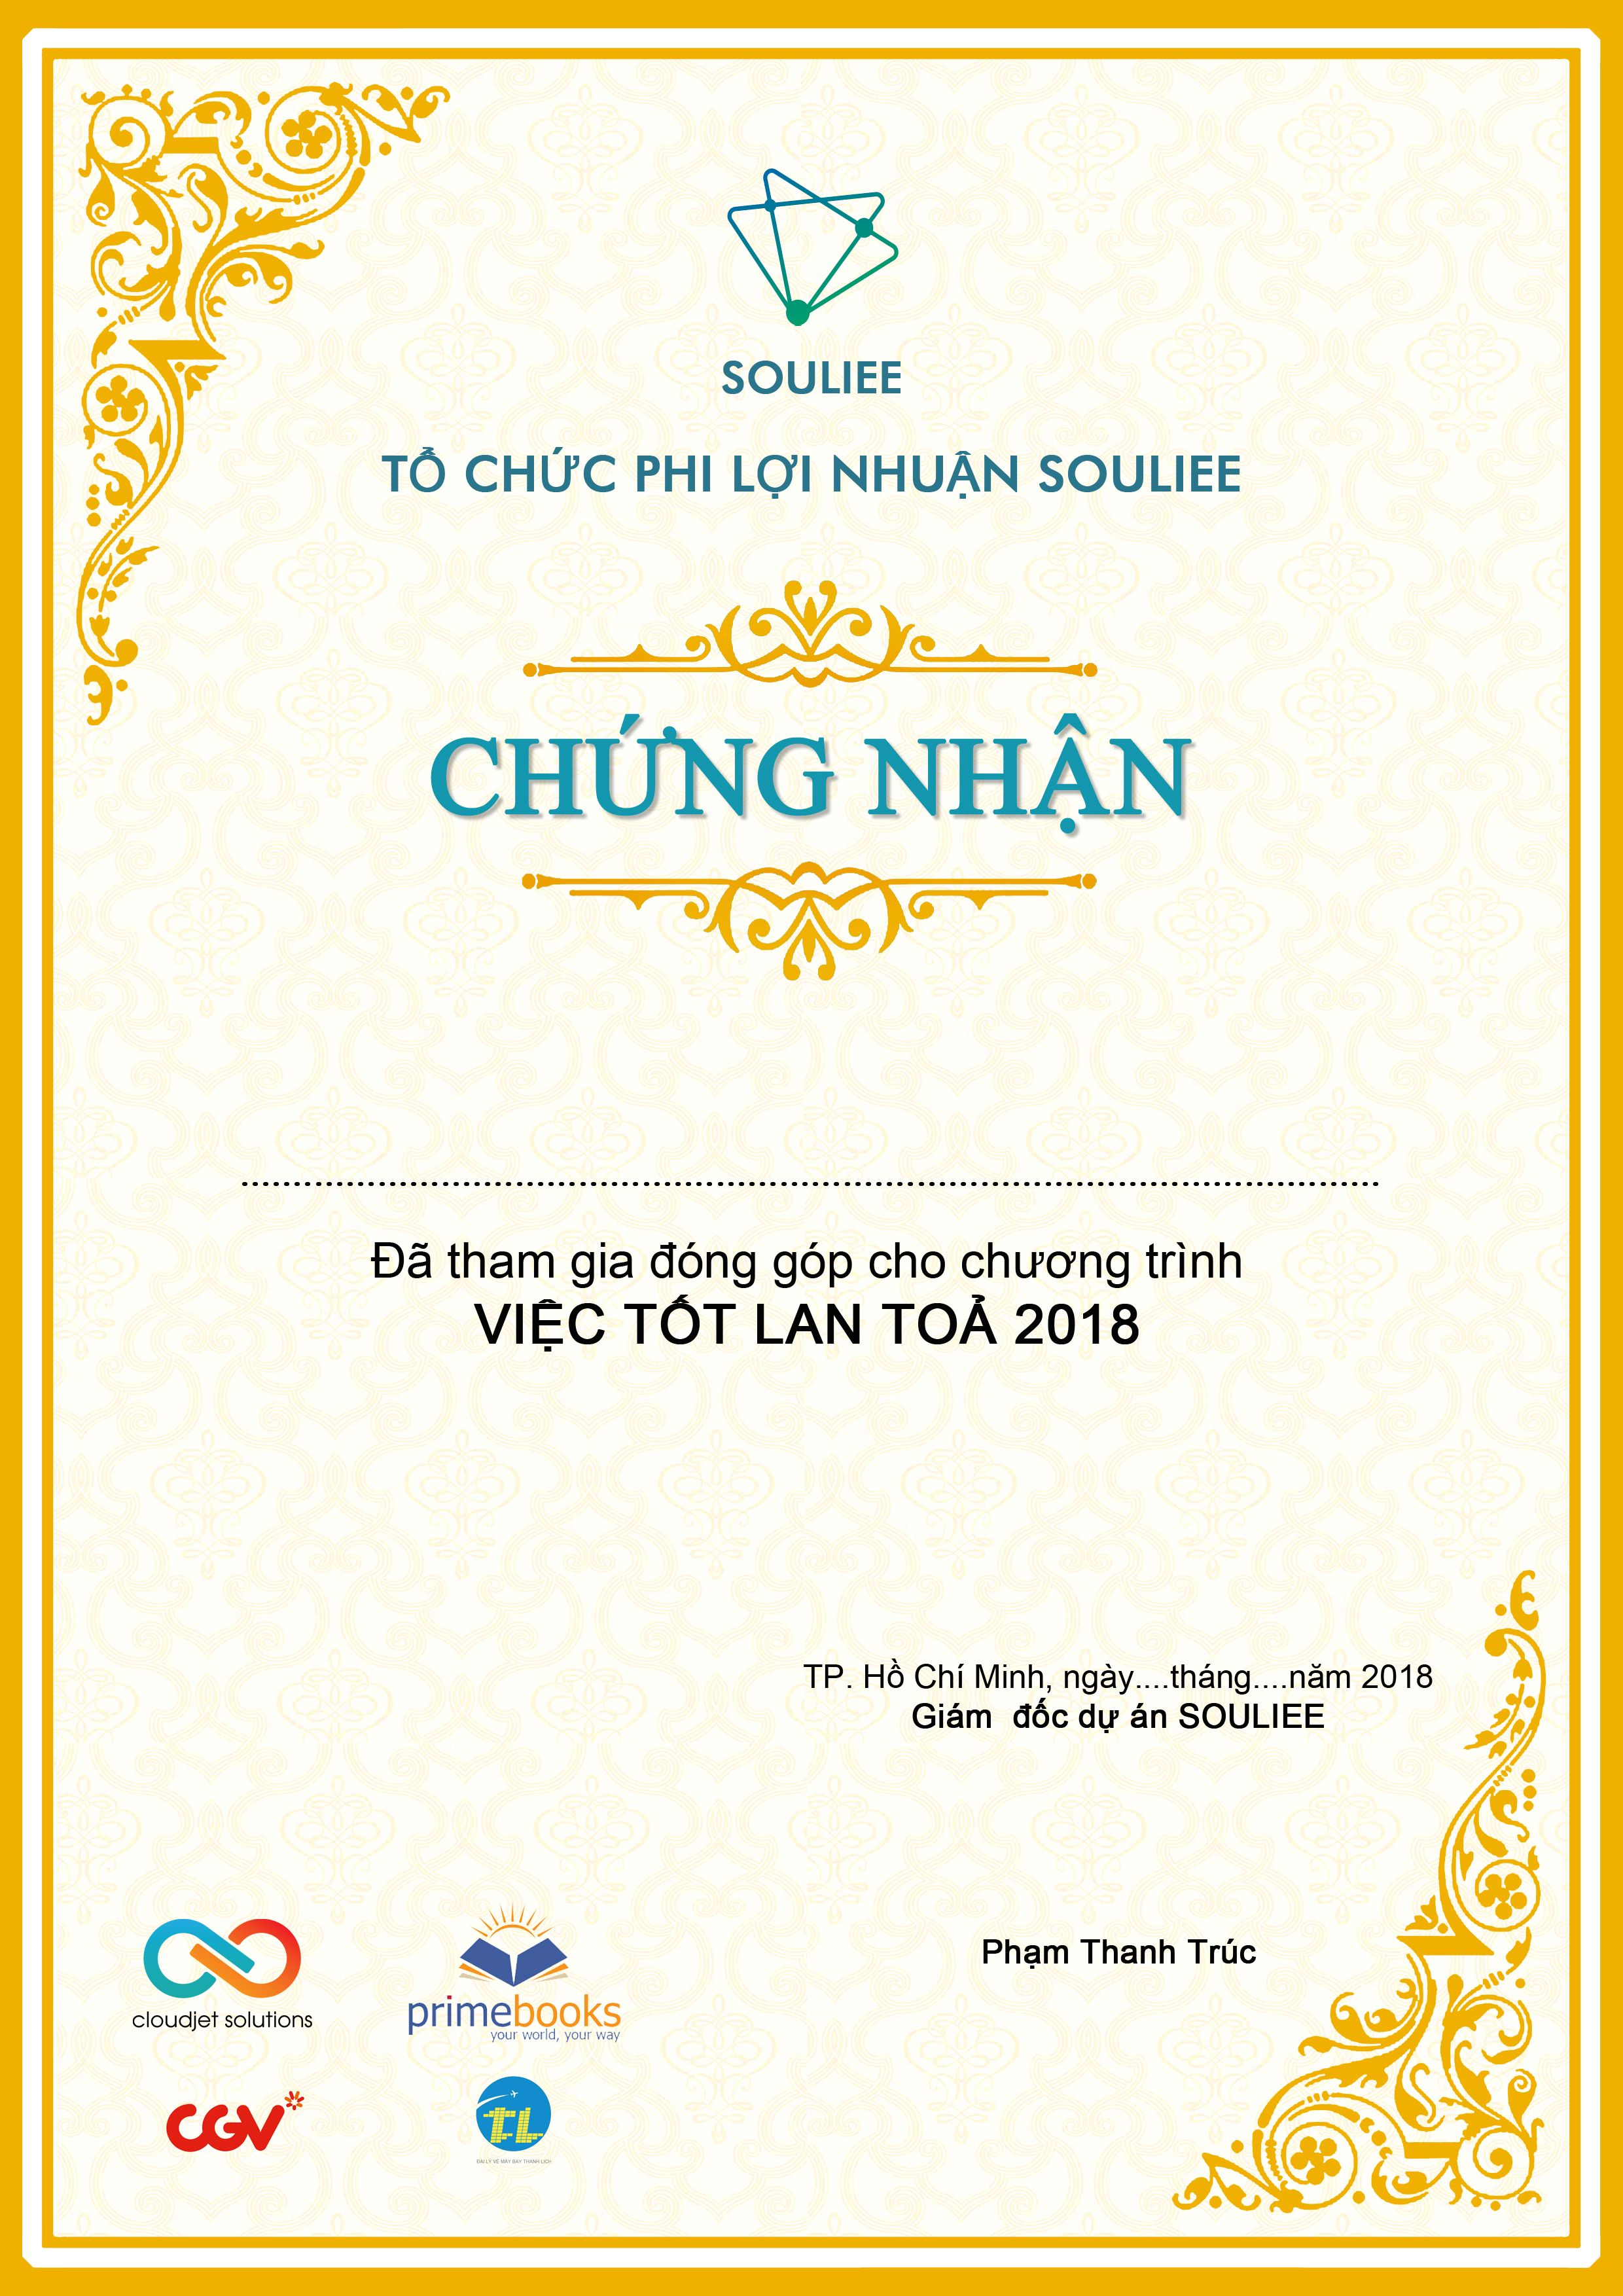 Design Certificate For Non Profit Organization Souliee Graphic